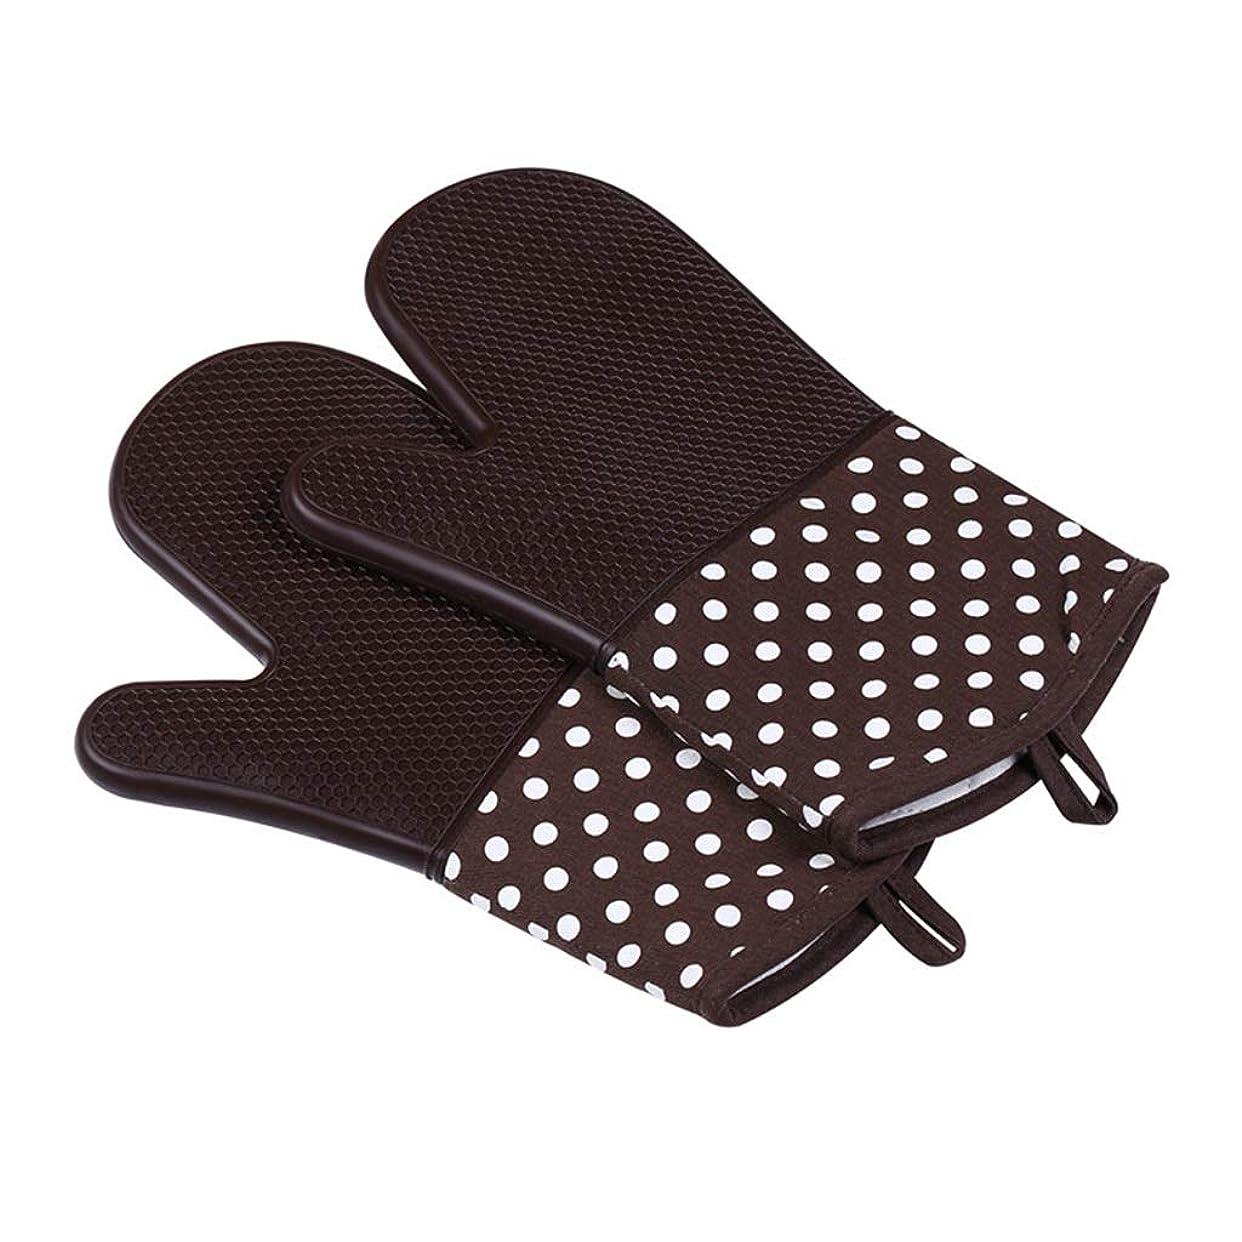 SGLI オーブン断熱ベーキンググローブ、工業用高温300度電子レンジグローブ、シリコングローブ6色オプション 手套 (Color : Brown)